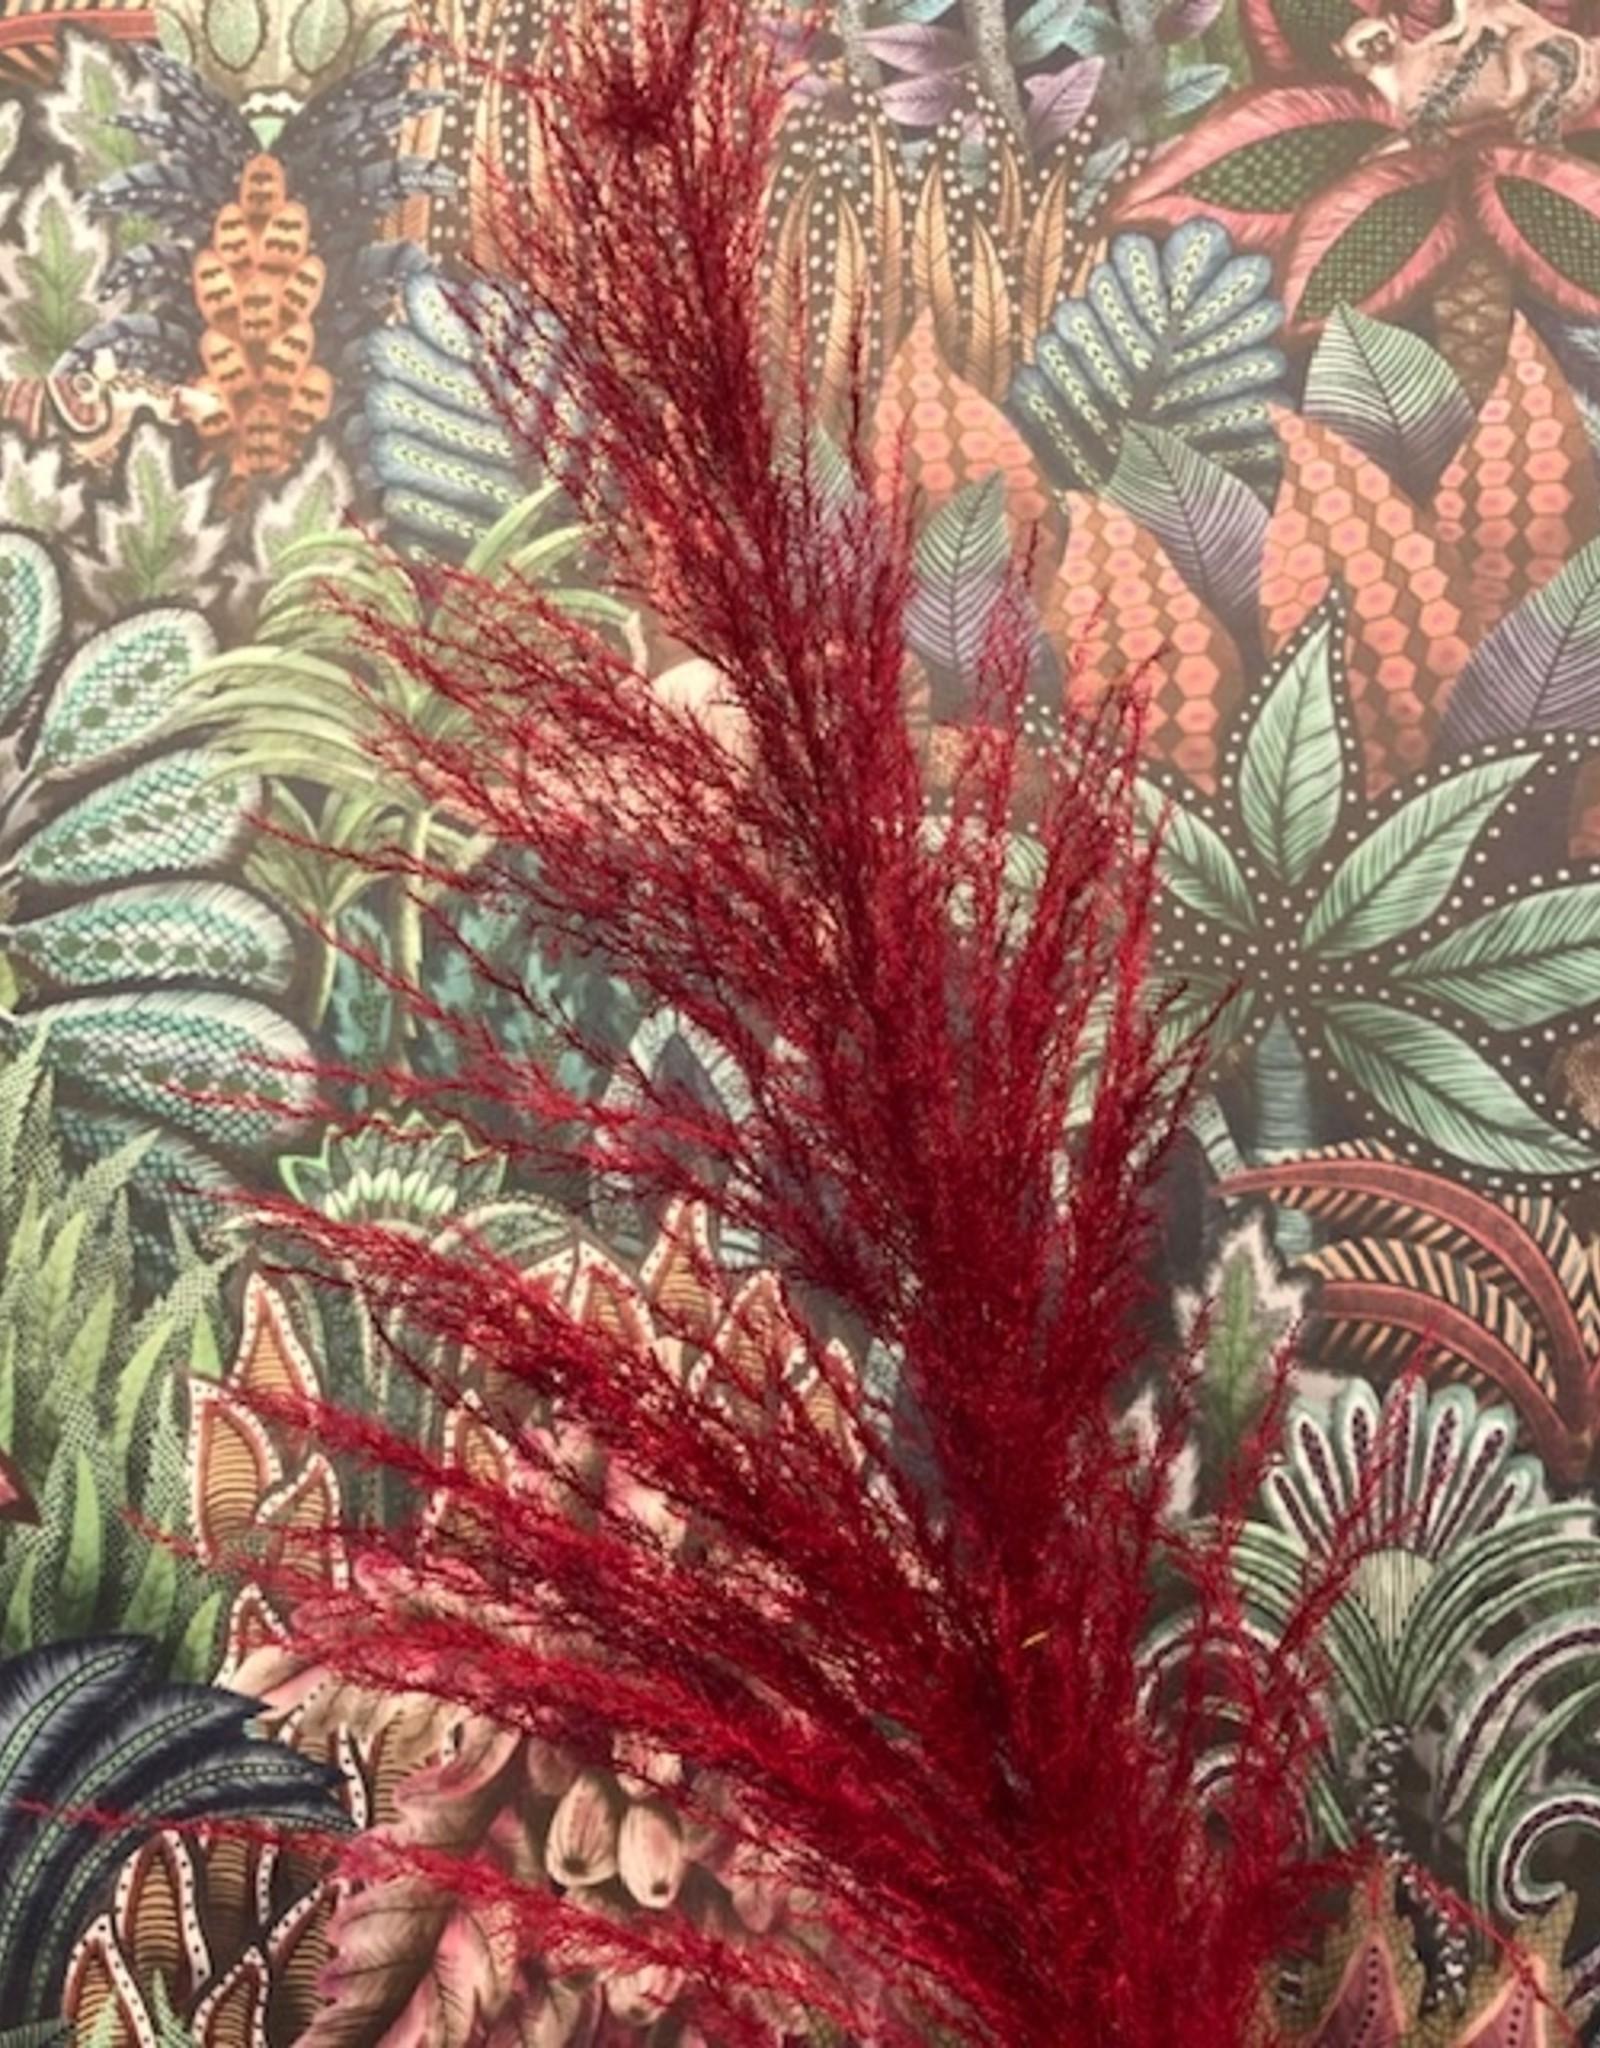 Droogbloemen Pampas Pluim - roze/rood